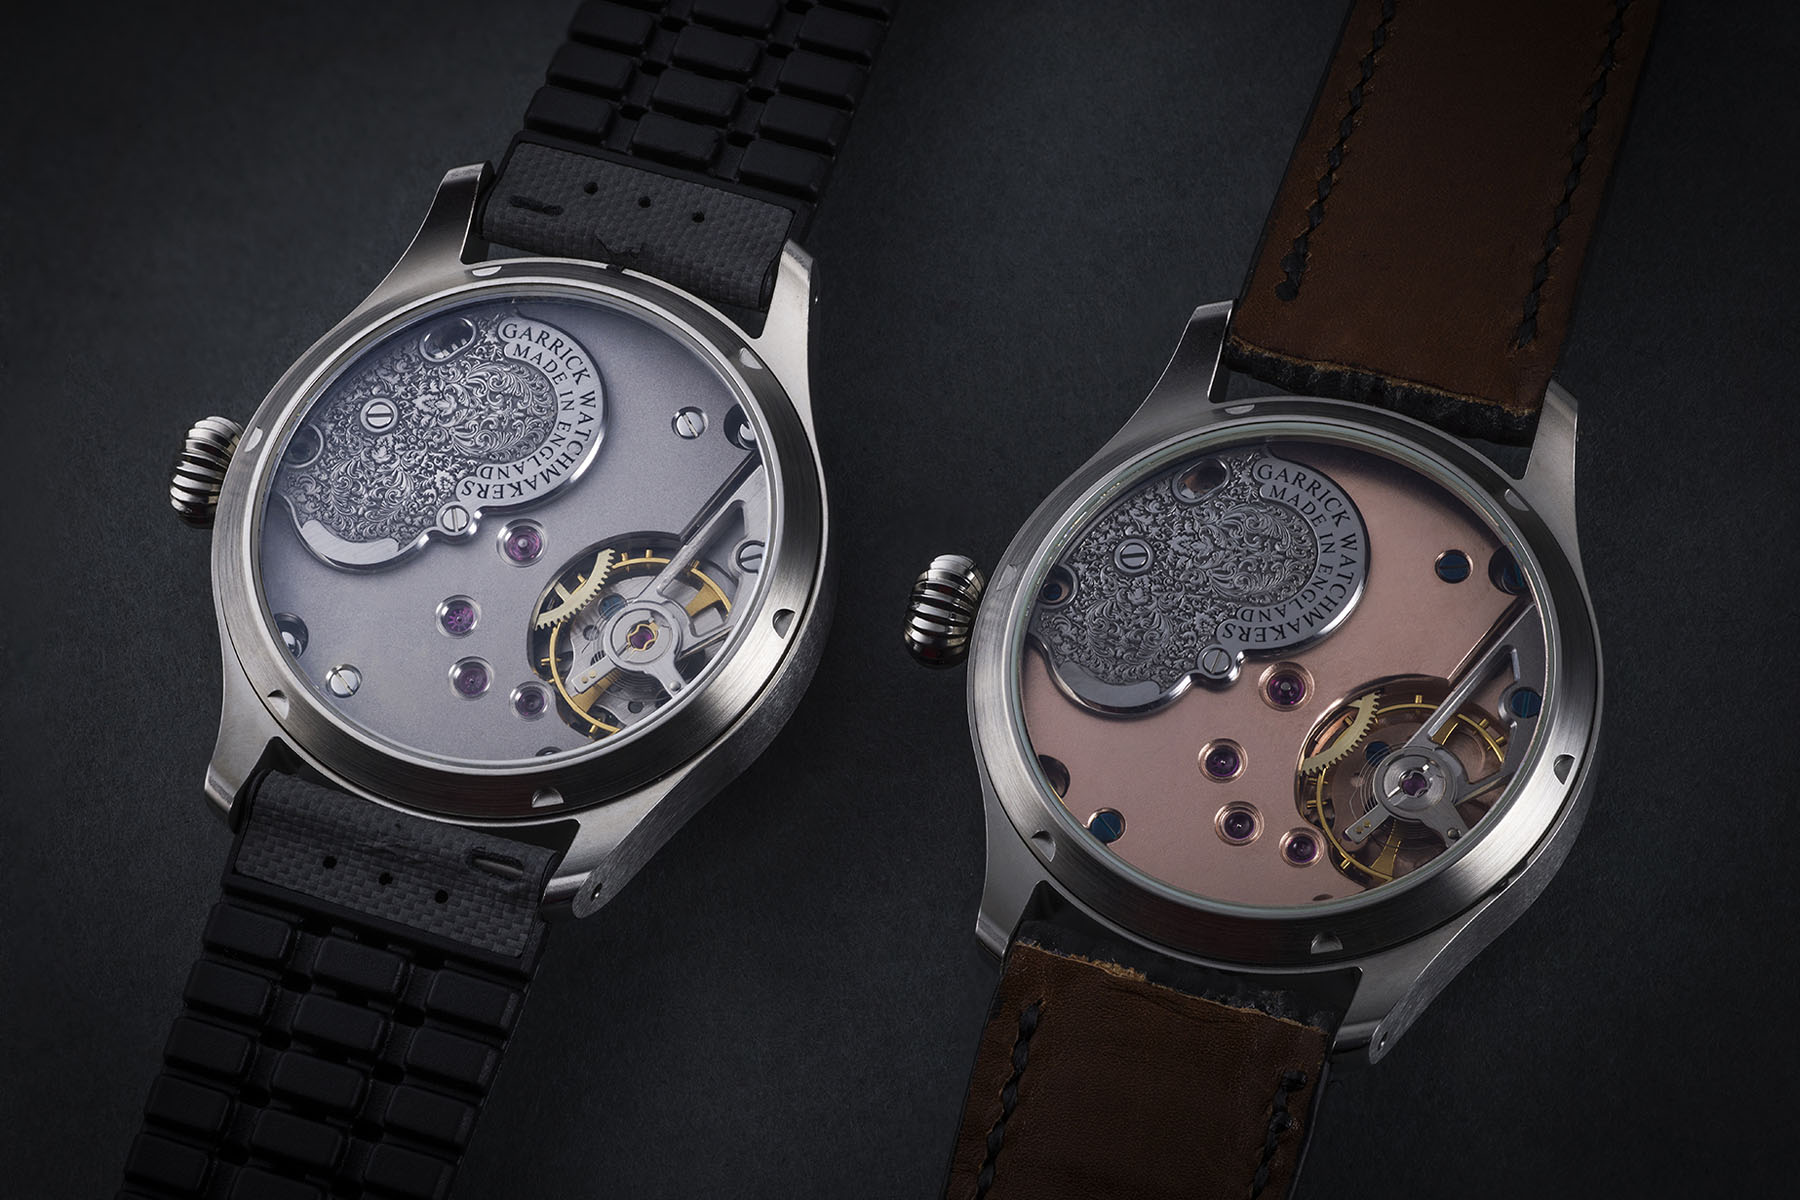 Garrick S4 watch - Independent Watchmaking England